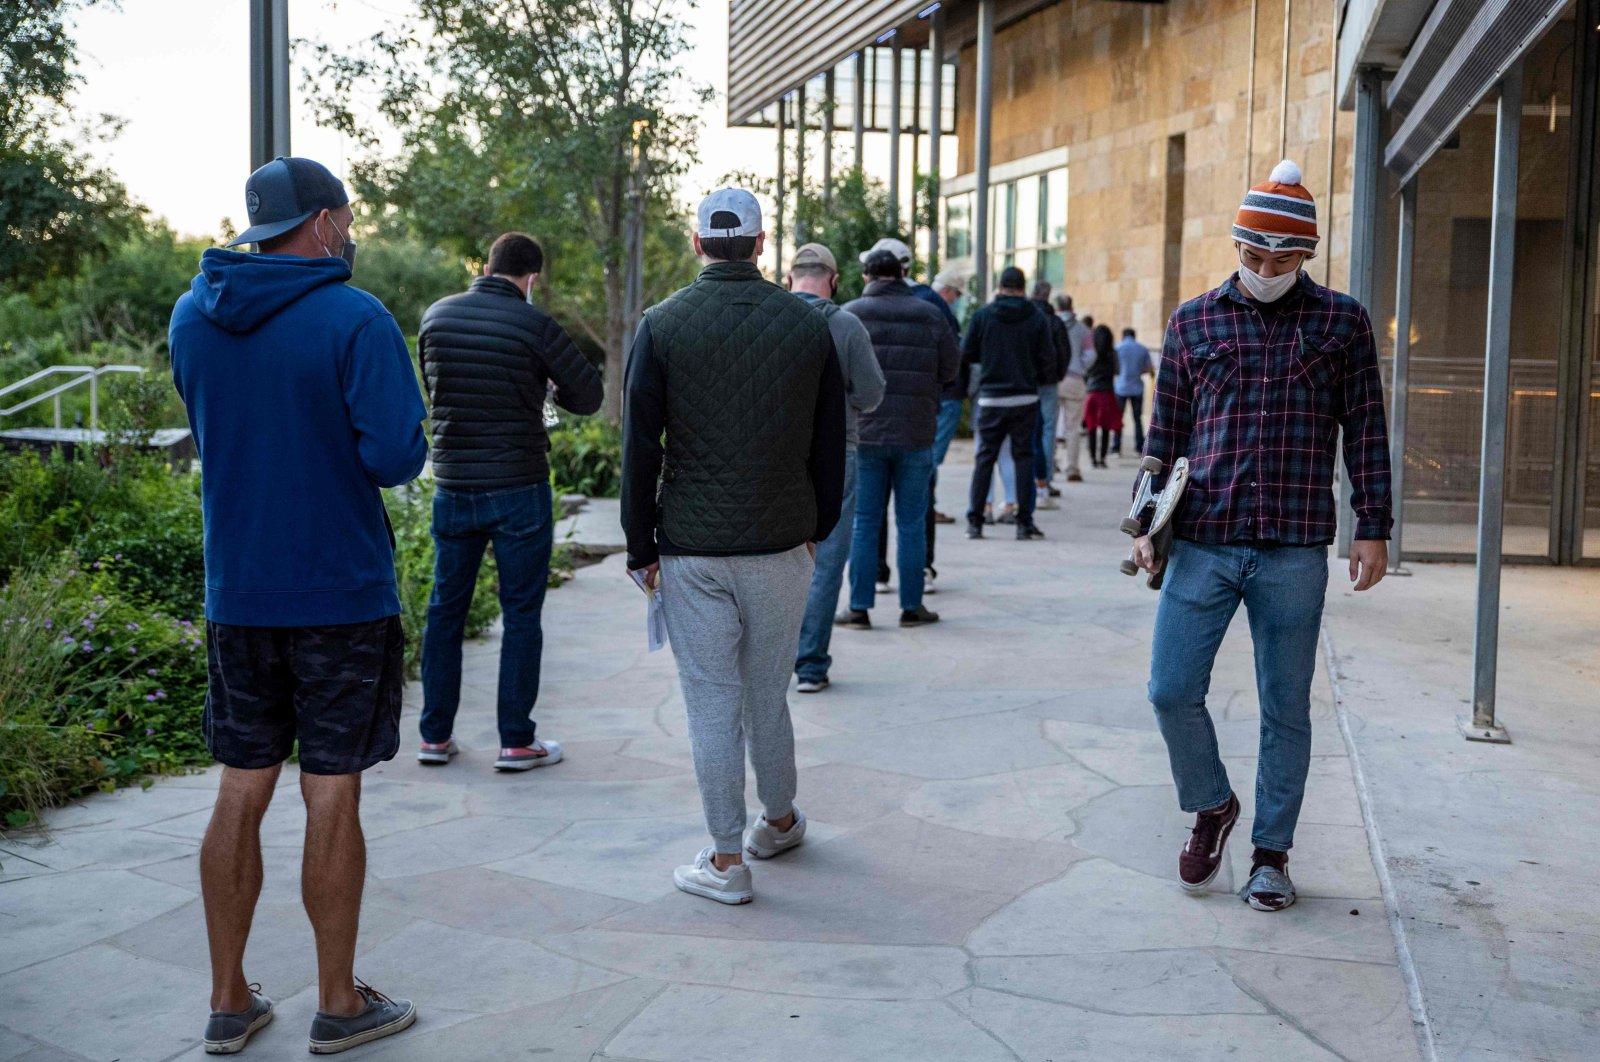 Voters wait in line cast their vote, Austin, Texas, Nov. 3, 2020. (AFP Photo)